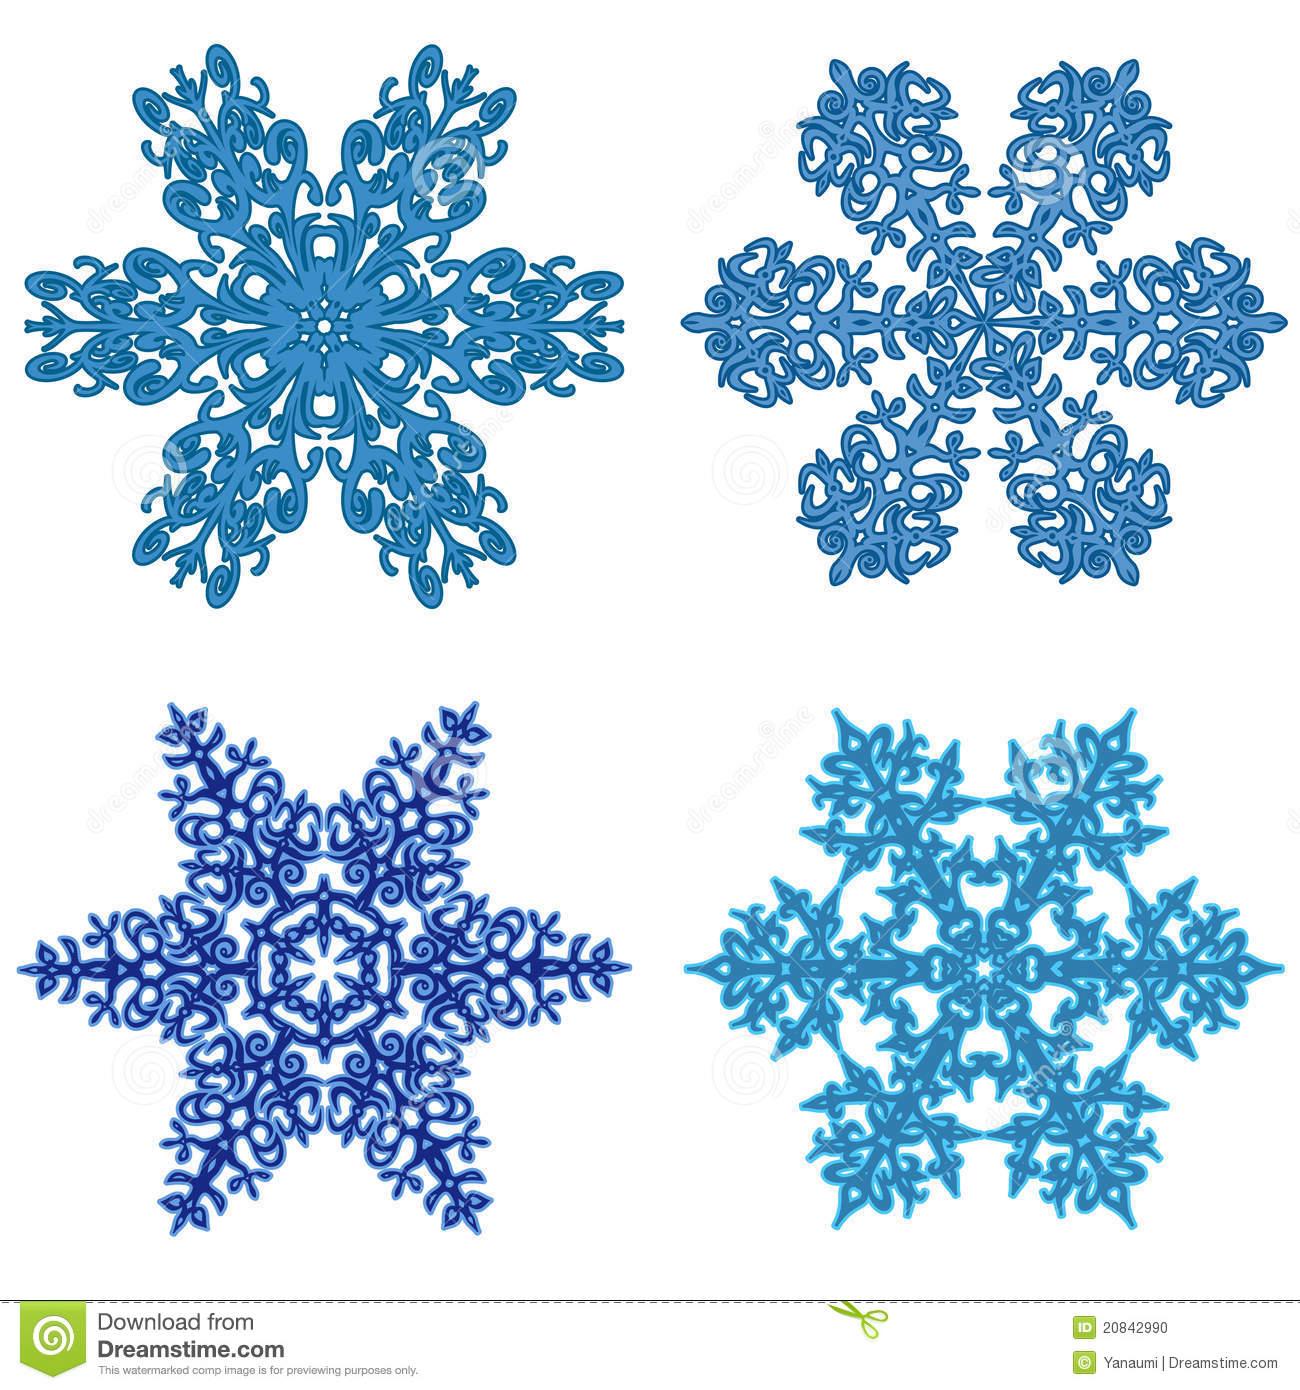 Snowflake Clipart Snowflake Clipart Snowflake Clipart Snowflake